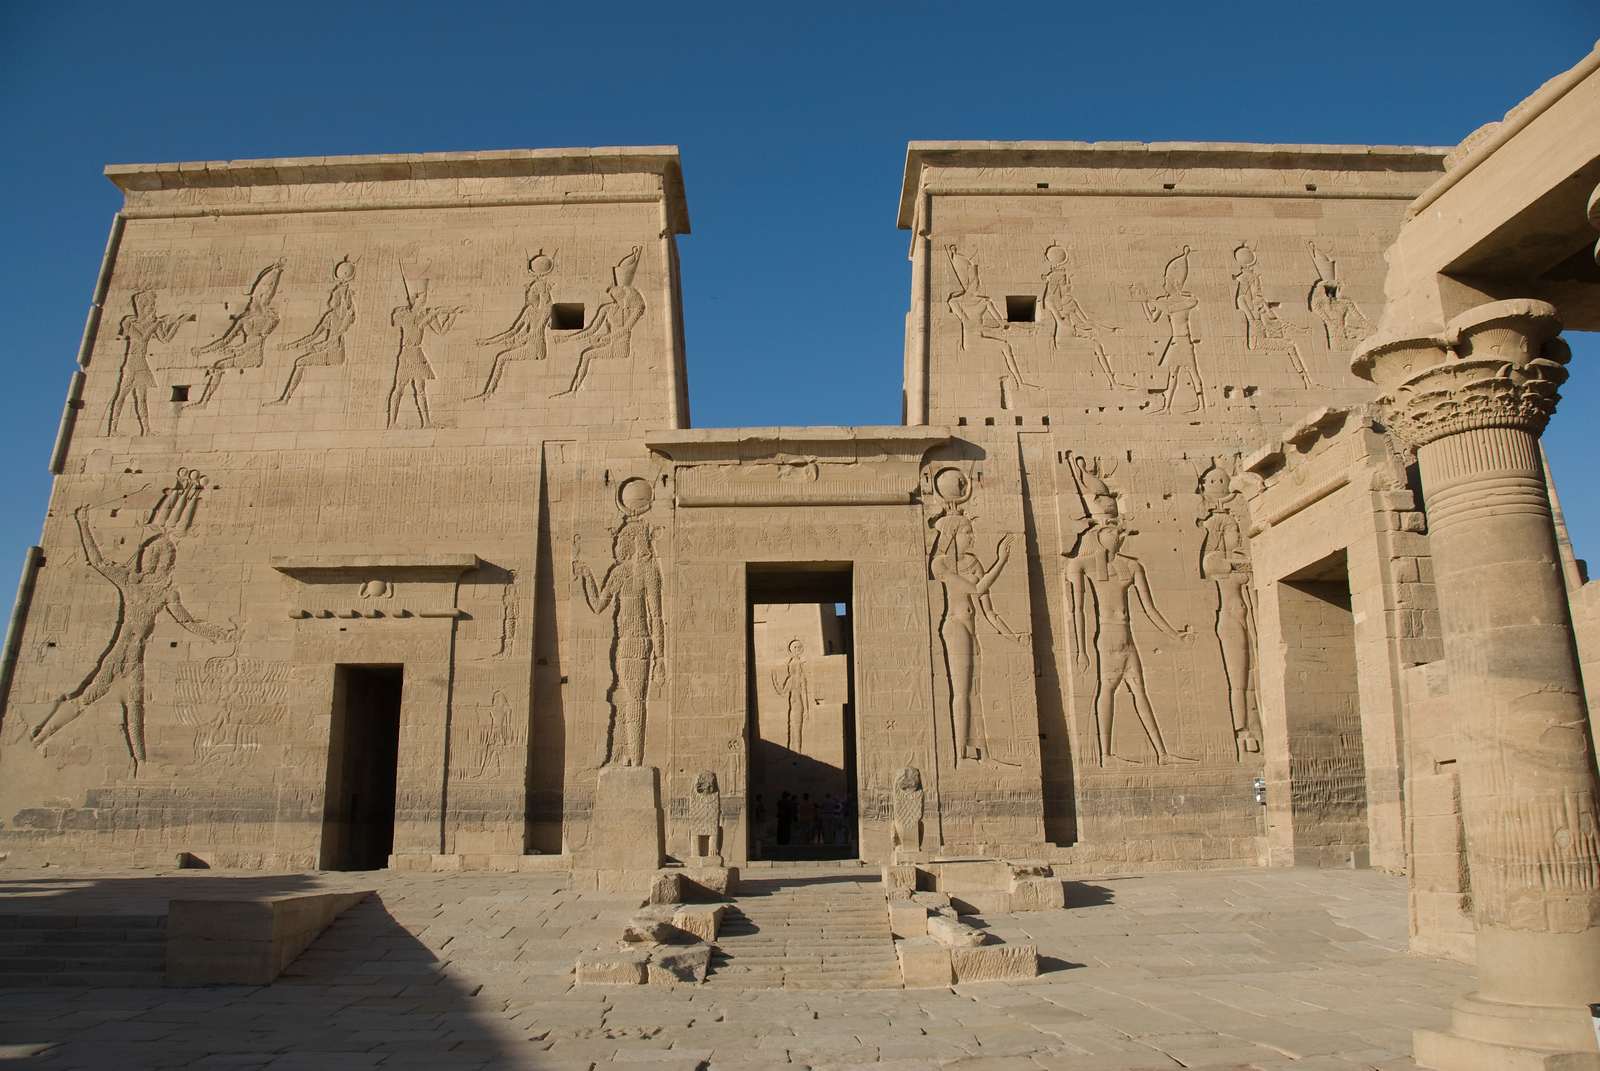 Nubian Monuments from Abu Simbel to Philae - UNESCO World Heritage Site